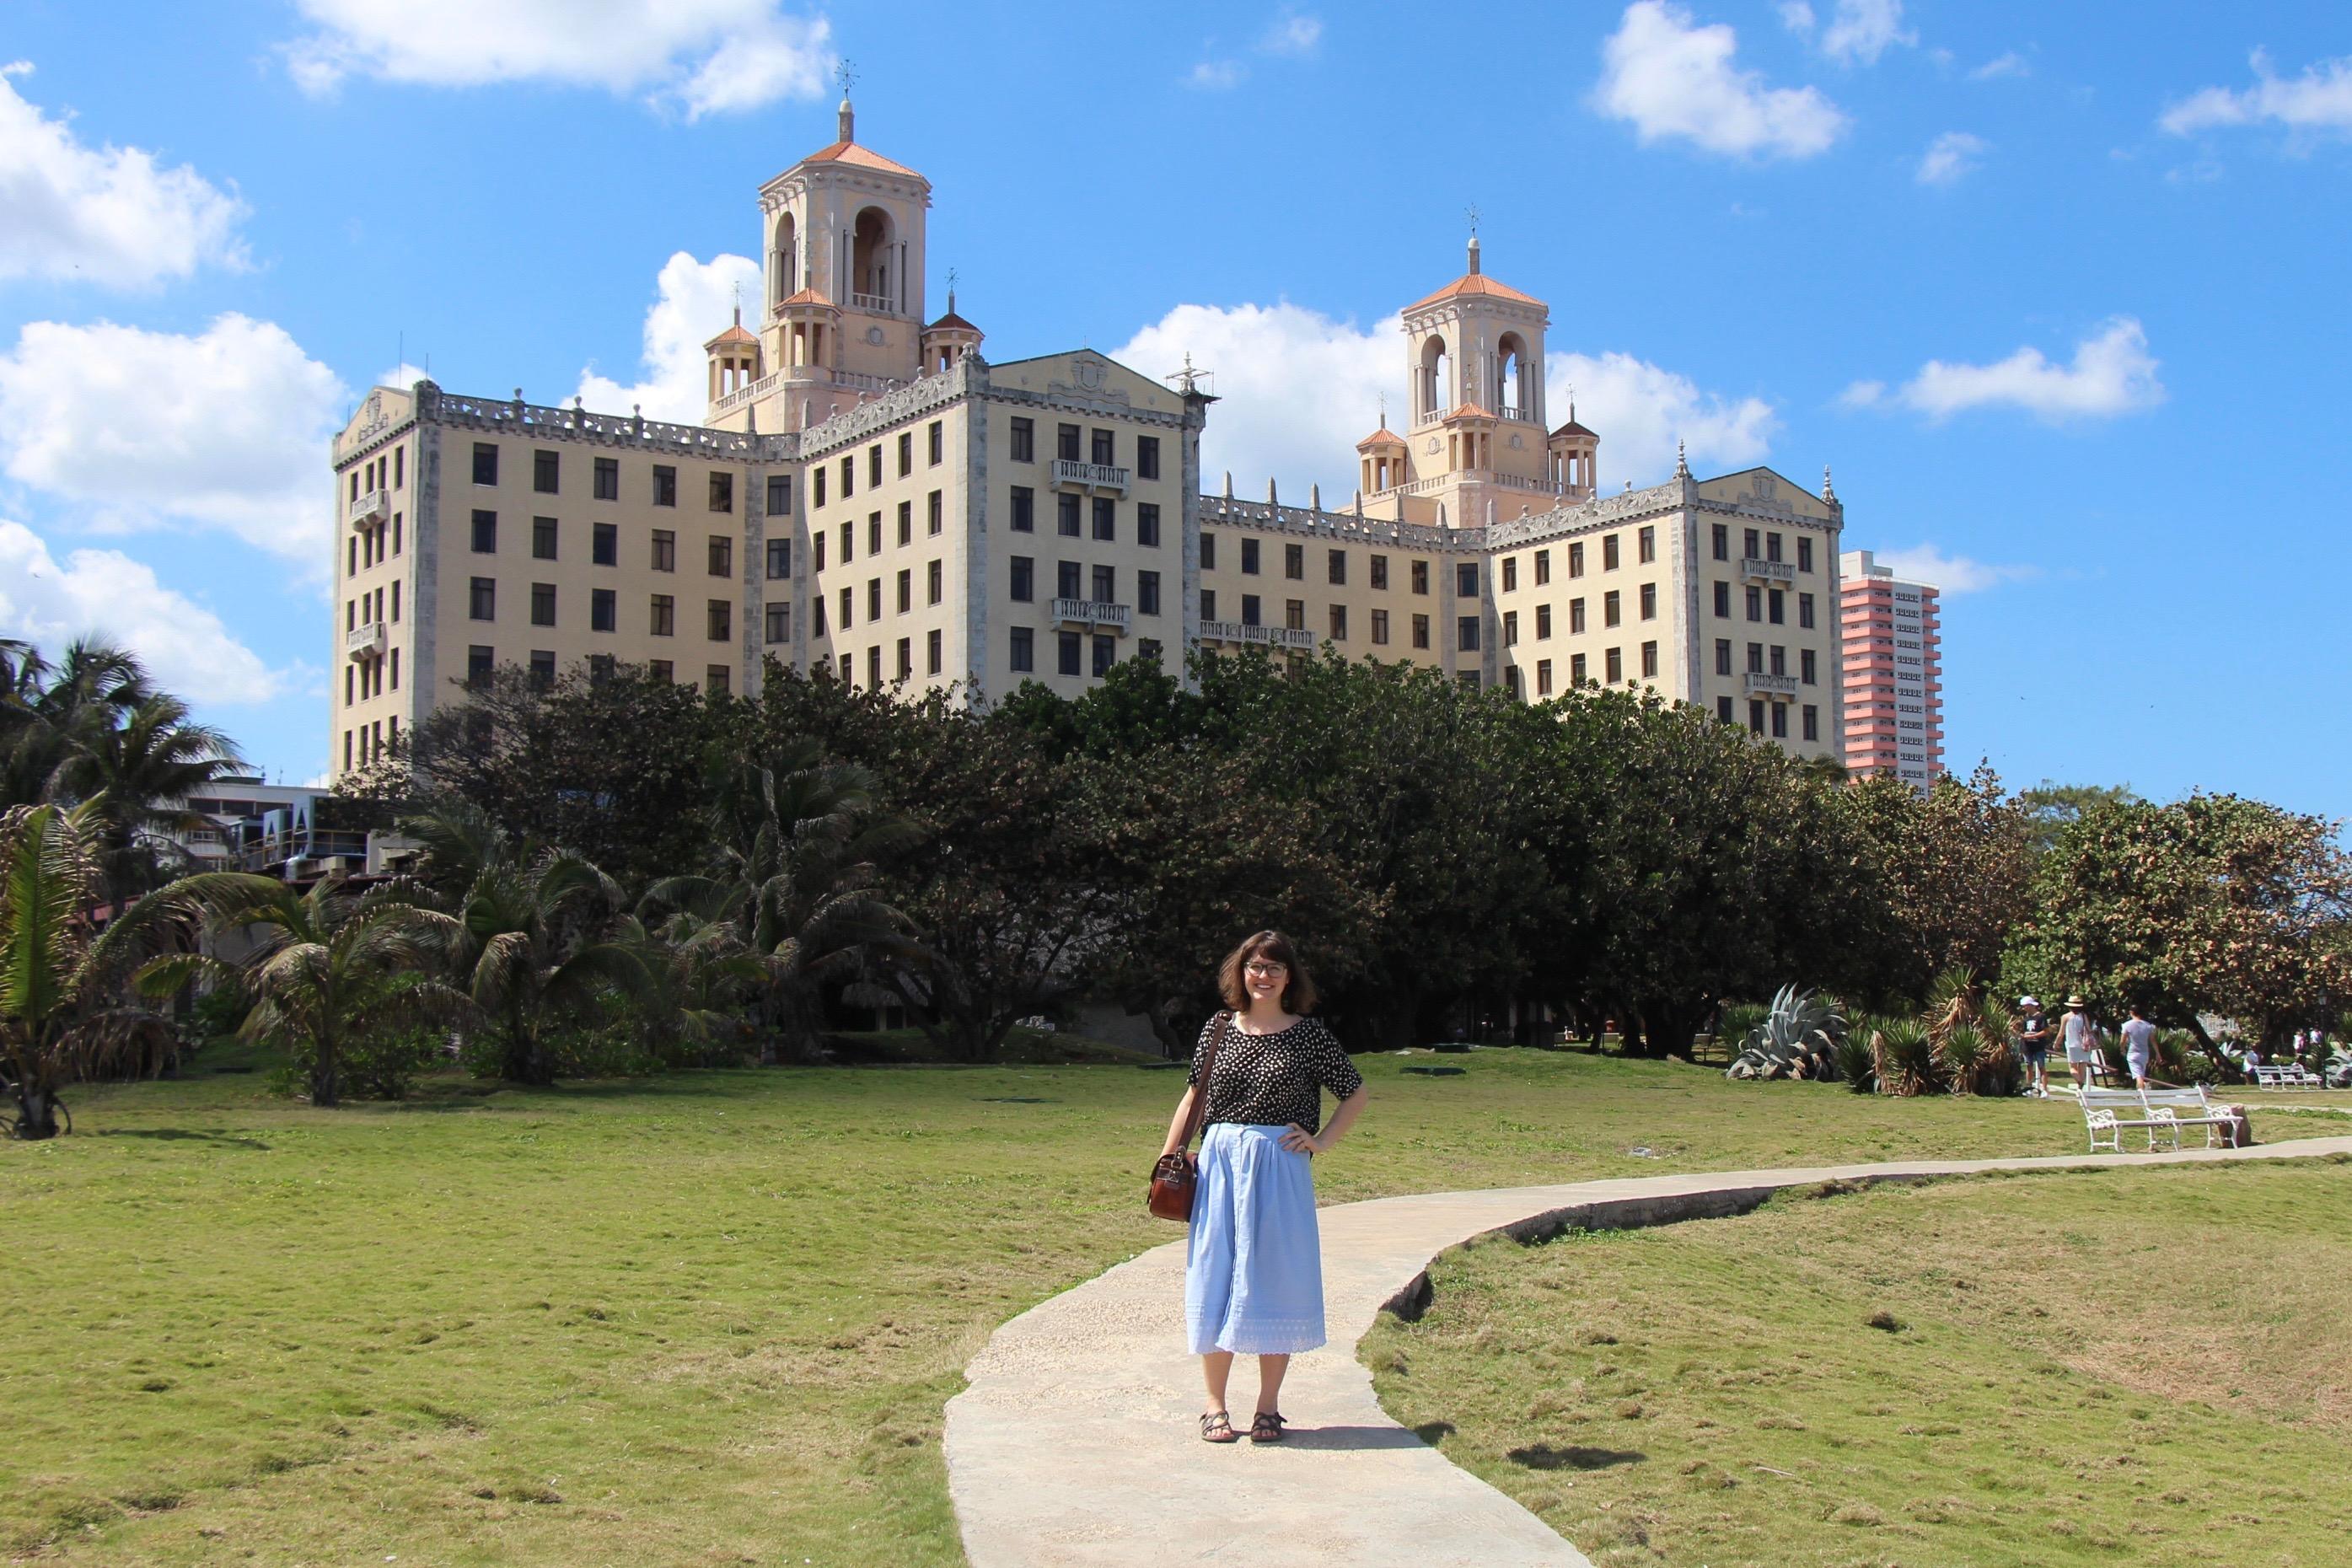 Hotel Nacional in Havana Cuba